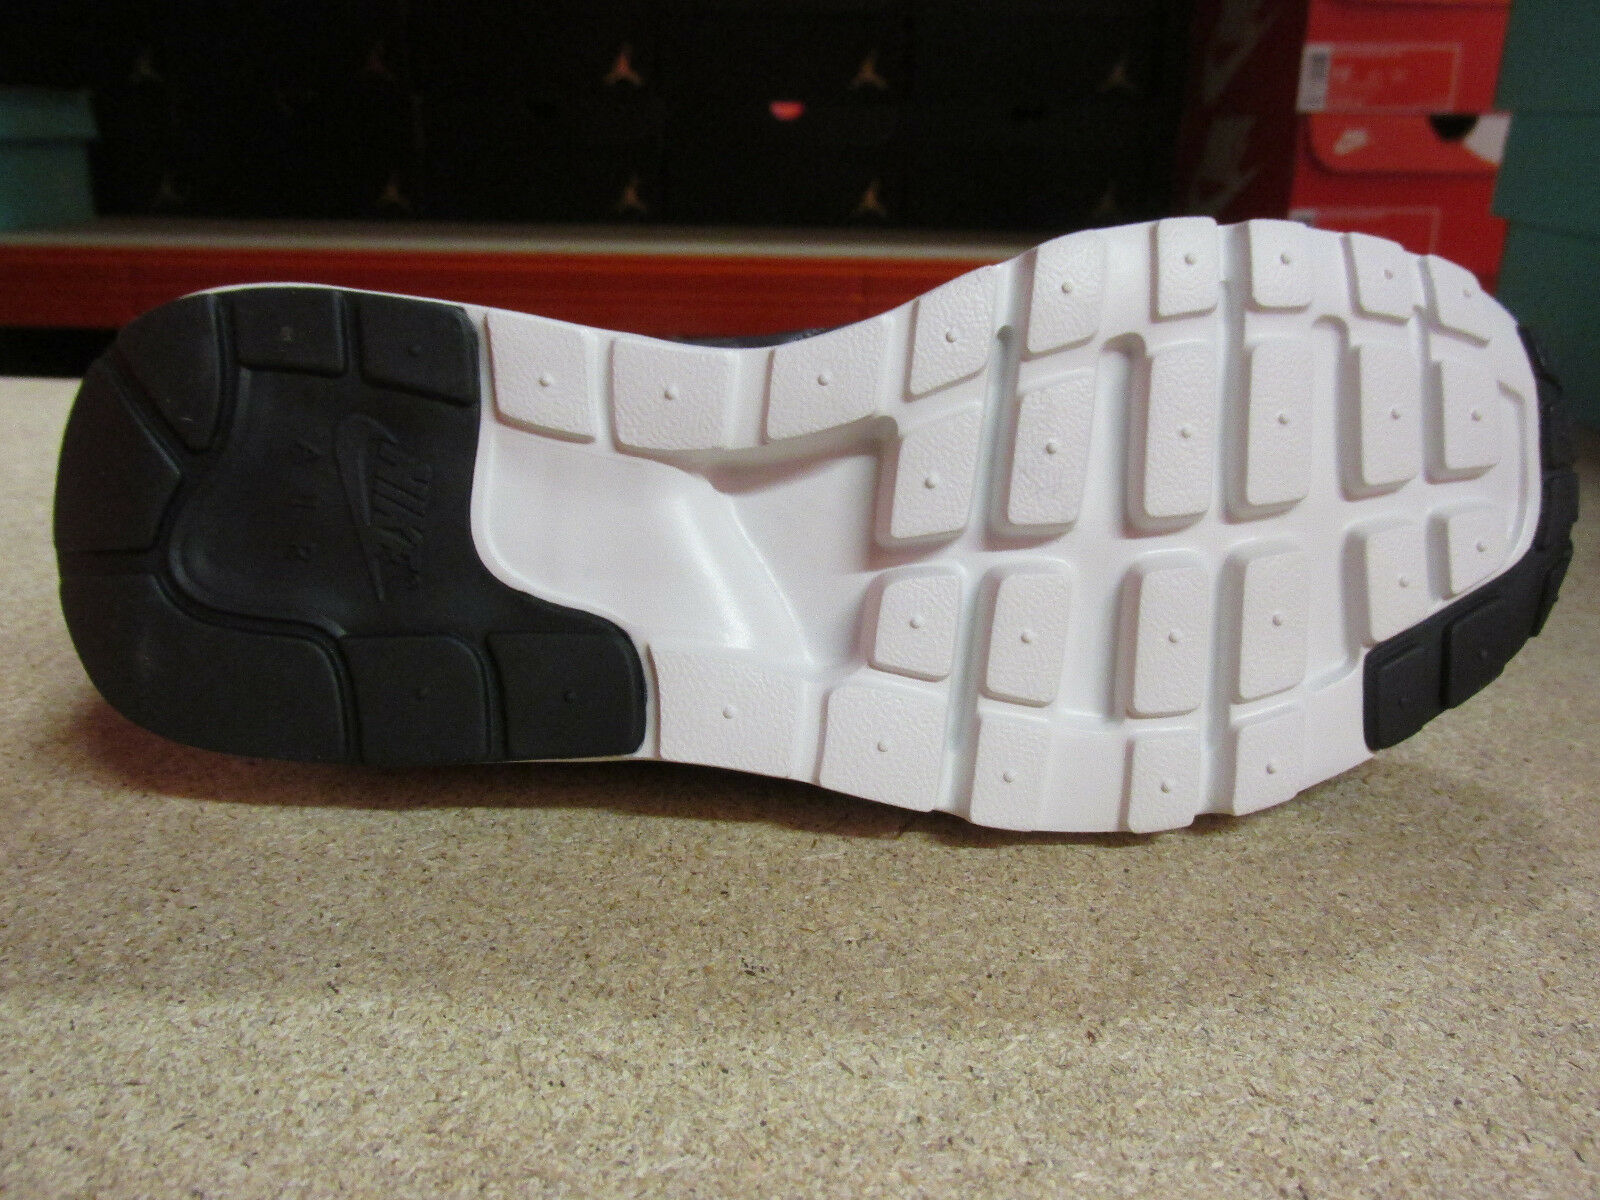 Nike air max 1 ultra jcrd - problem jcrd ultra frauen laufen trainer 861656 001 Turnschuhe, schuhe 4d0ef7